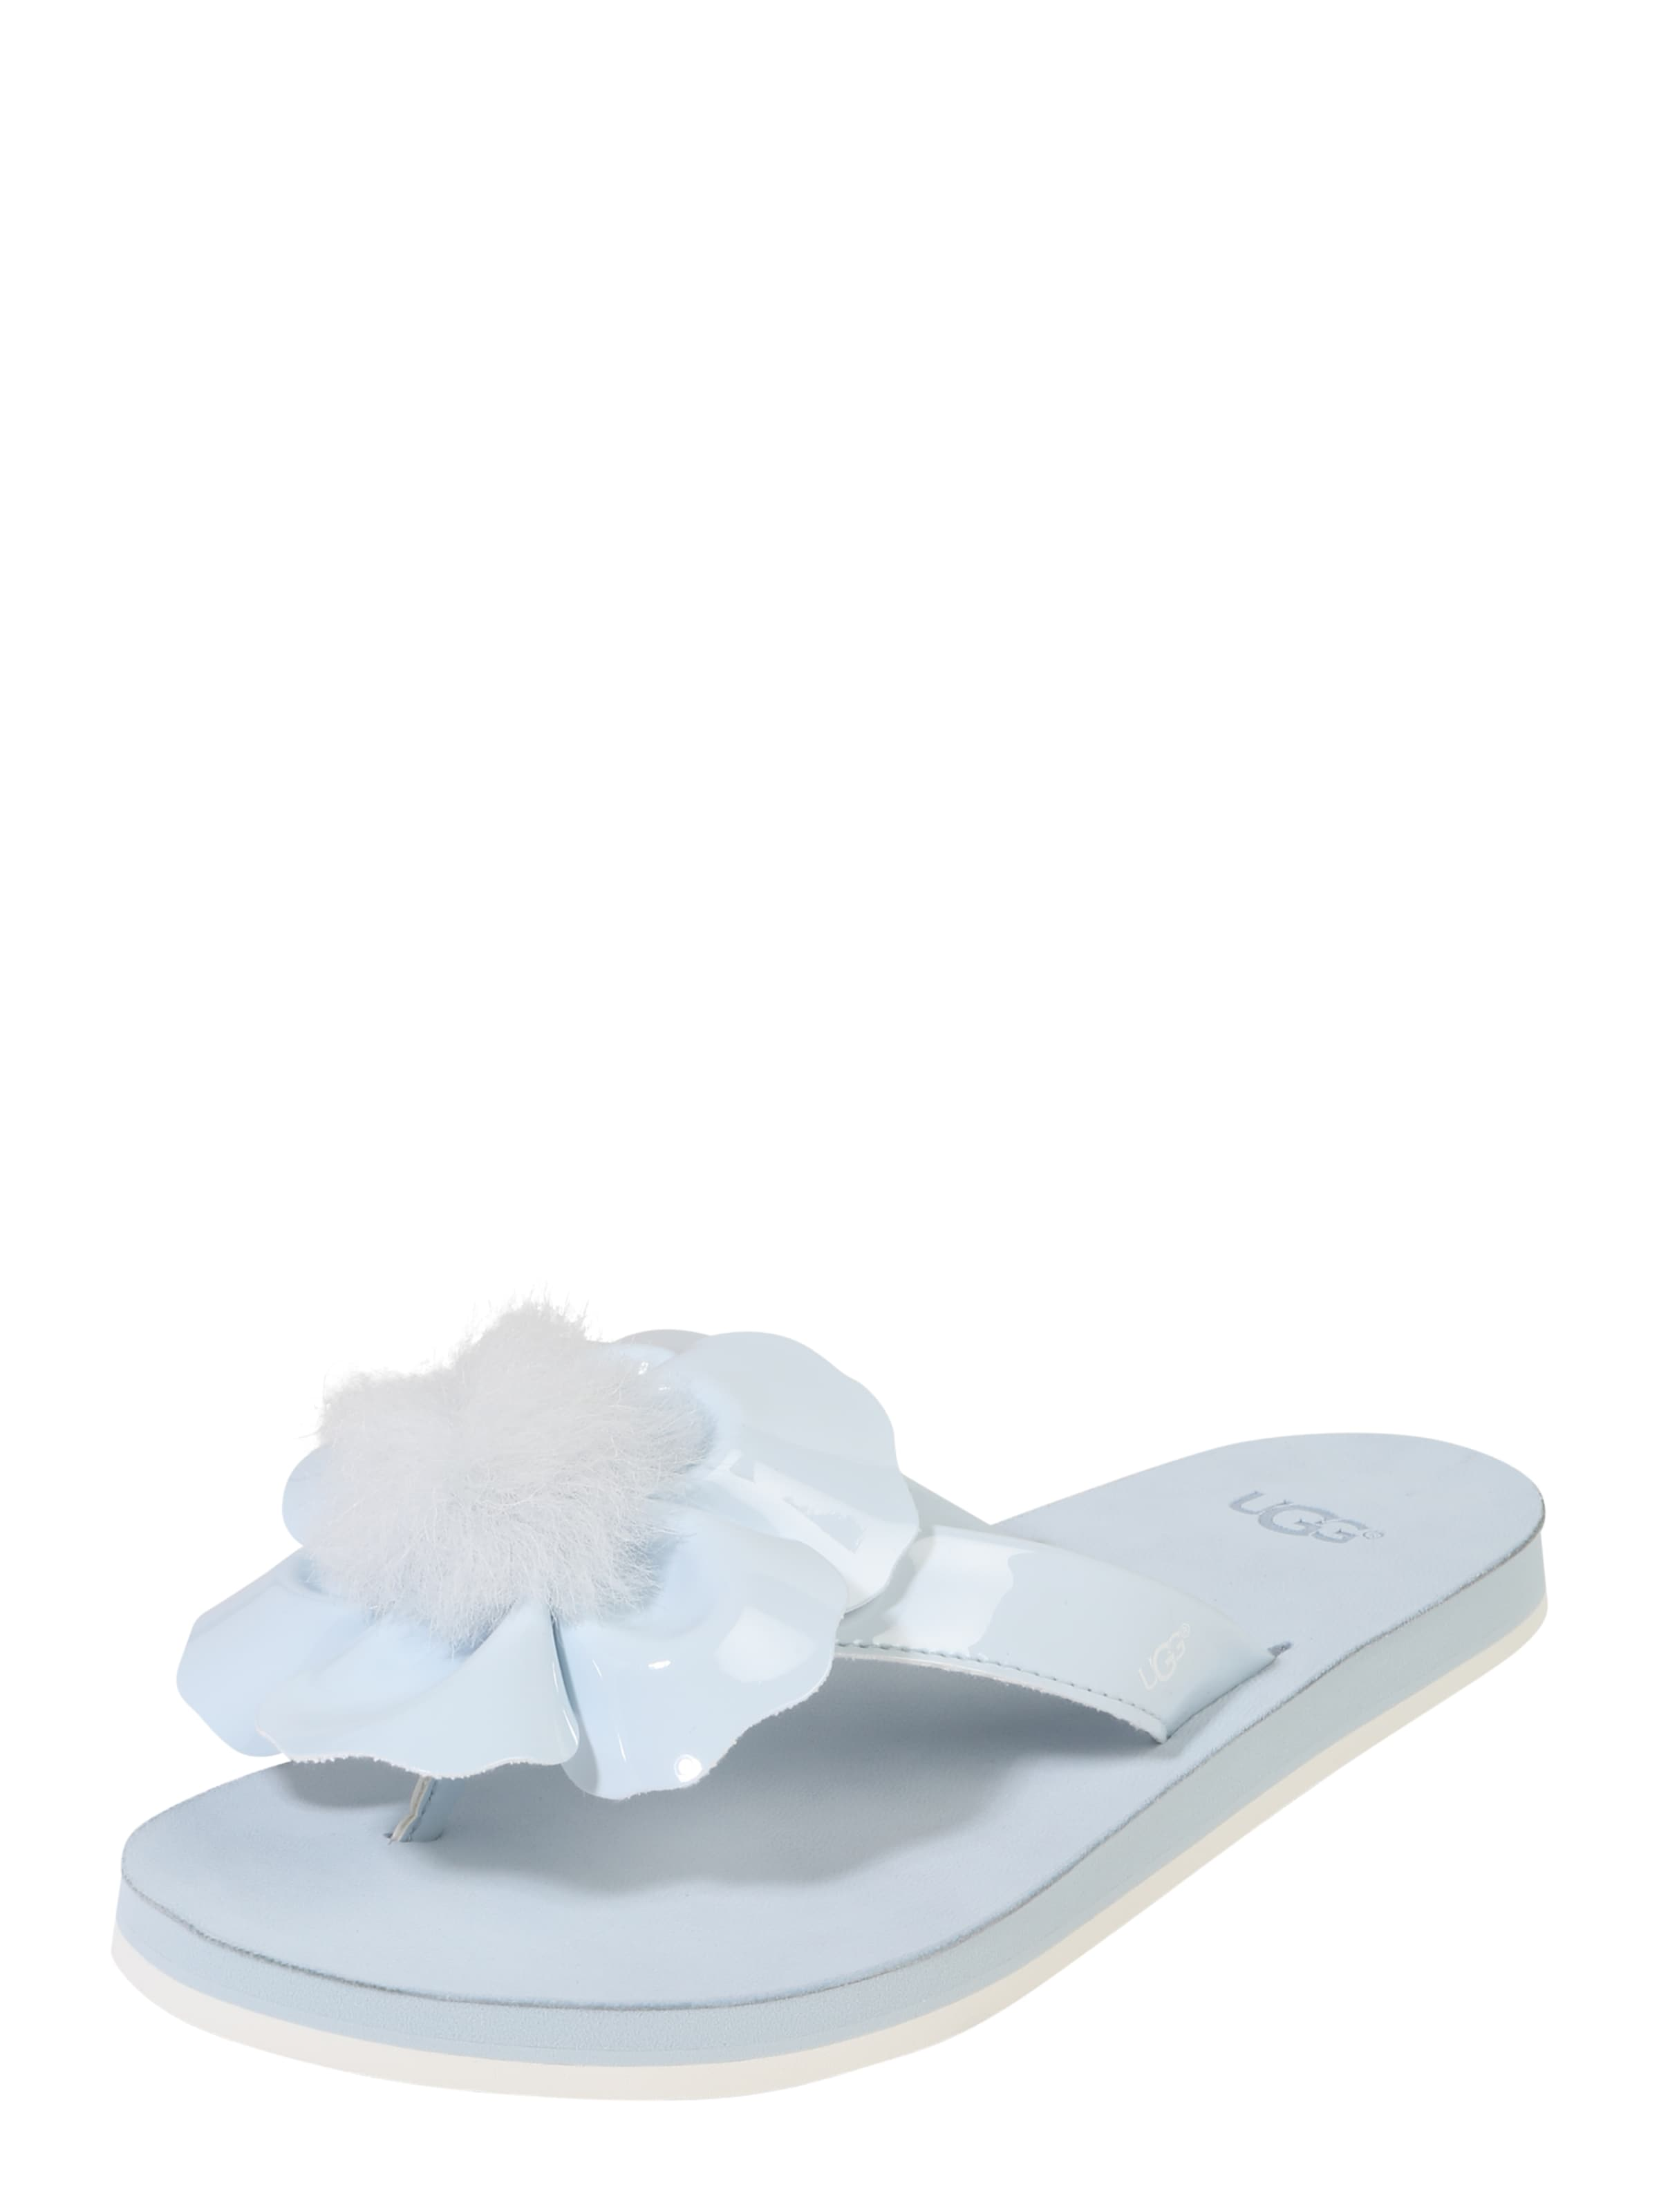 Ugg Santal « Coquelicot » Bleu Clair / Blanc RshD68ncm